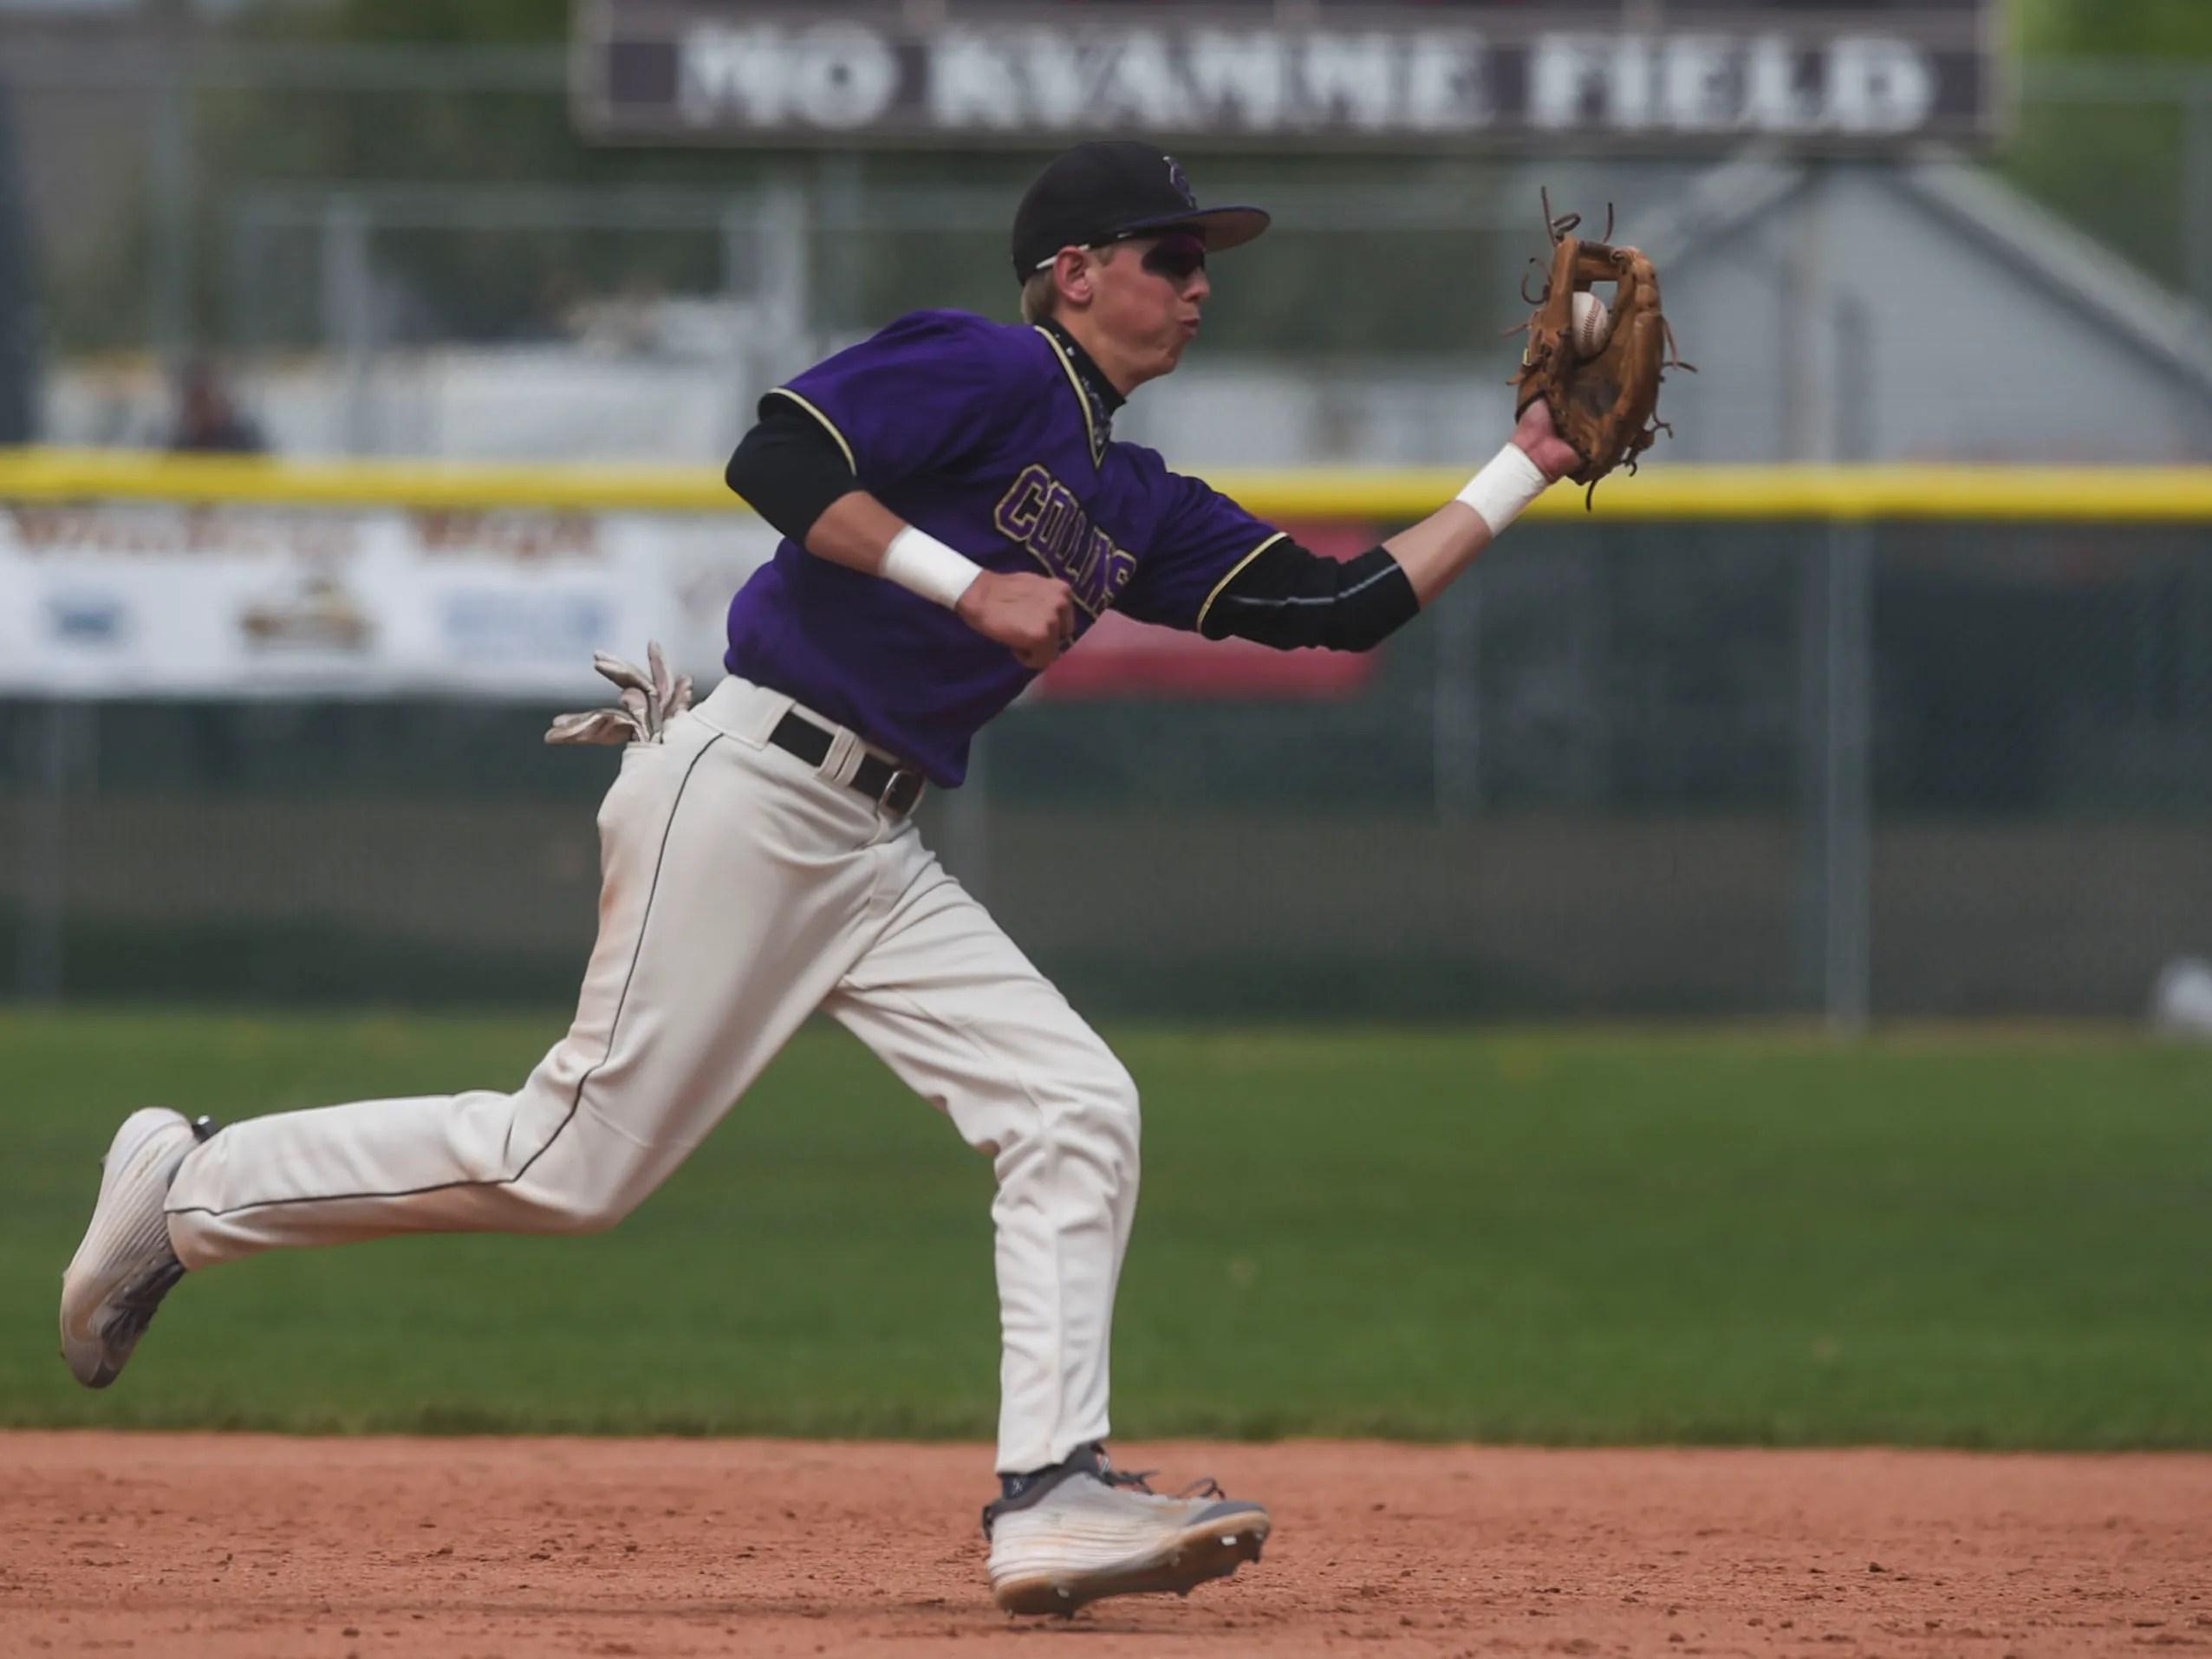 Fort Collins High School baseball player Jacob Moyer ...